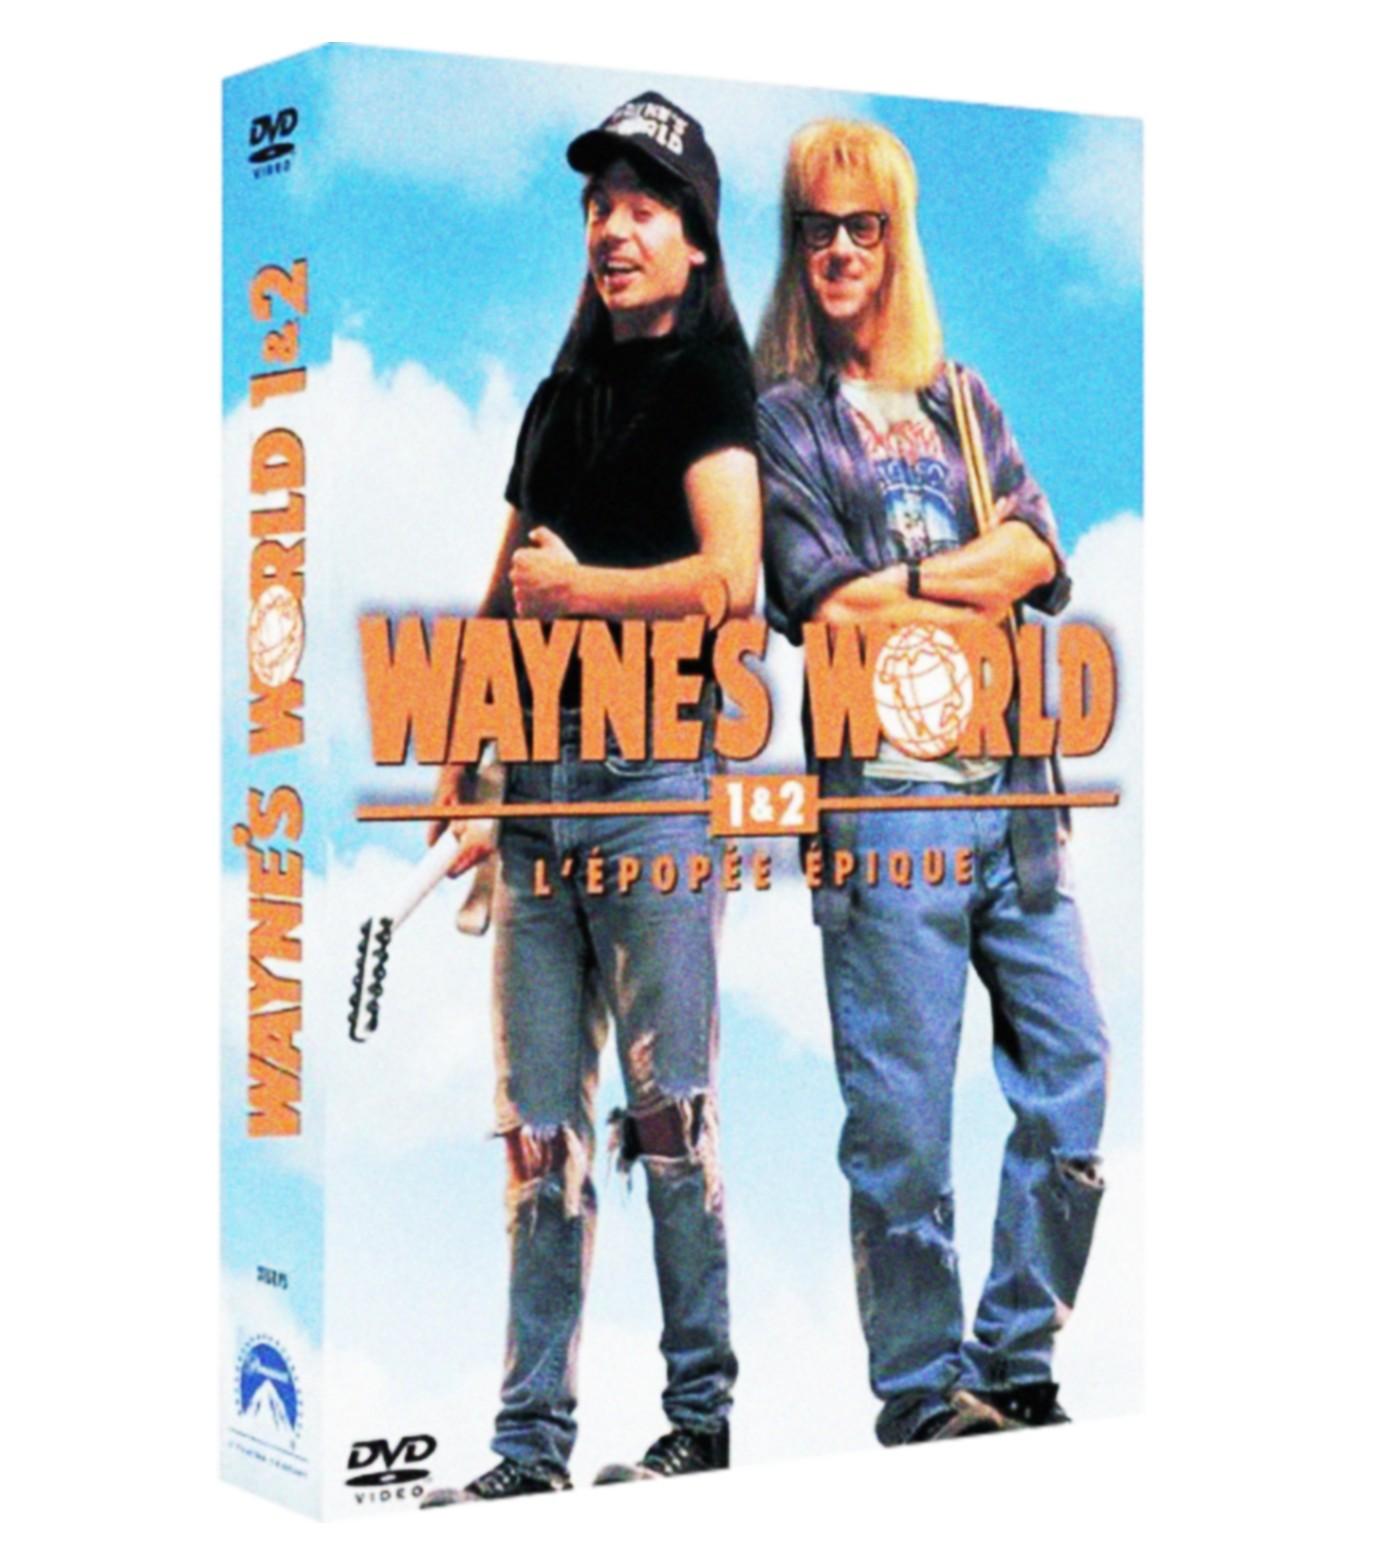 WAYNE'S WORLD 1 + 2